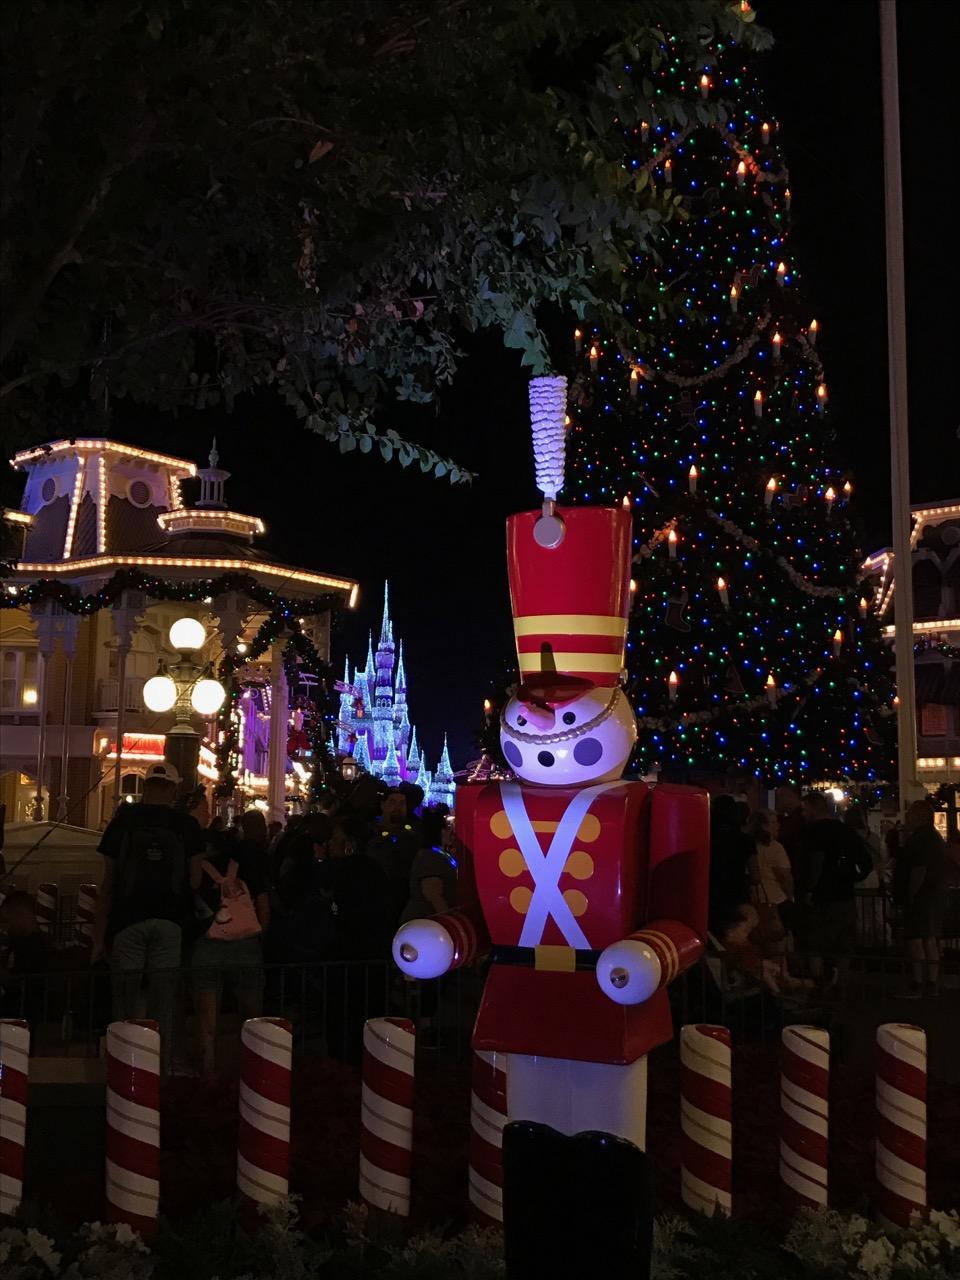 Magic Kingdom Christmas 2016 Toy Soilder